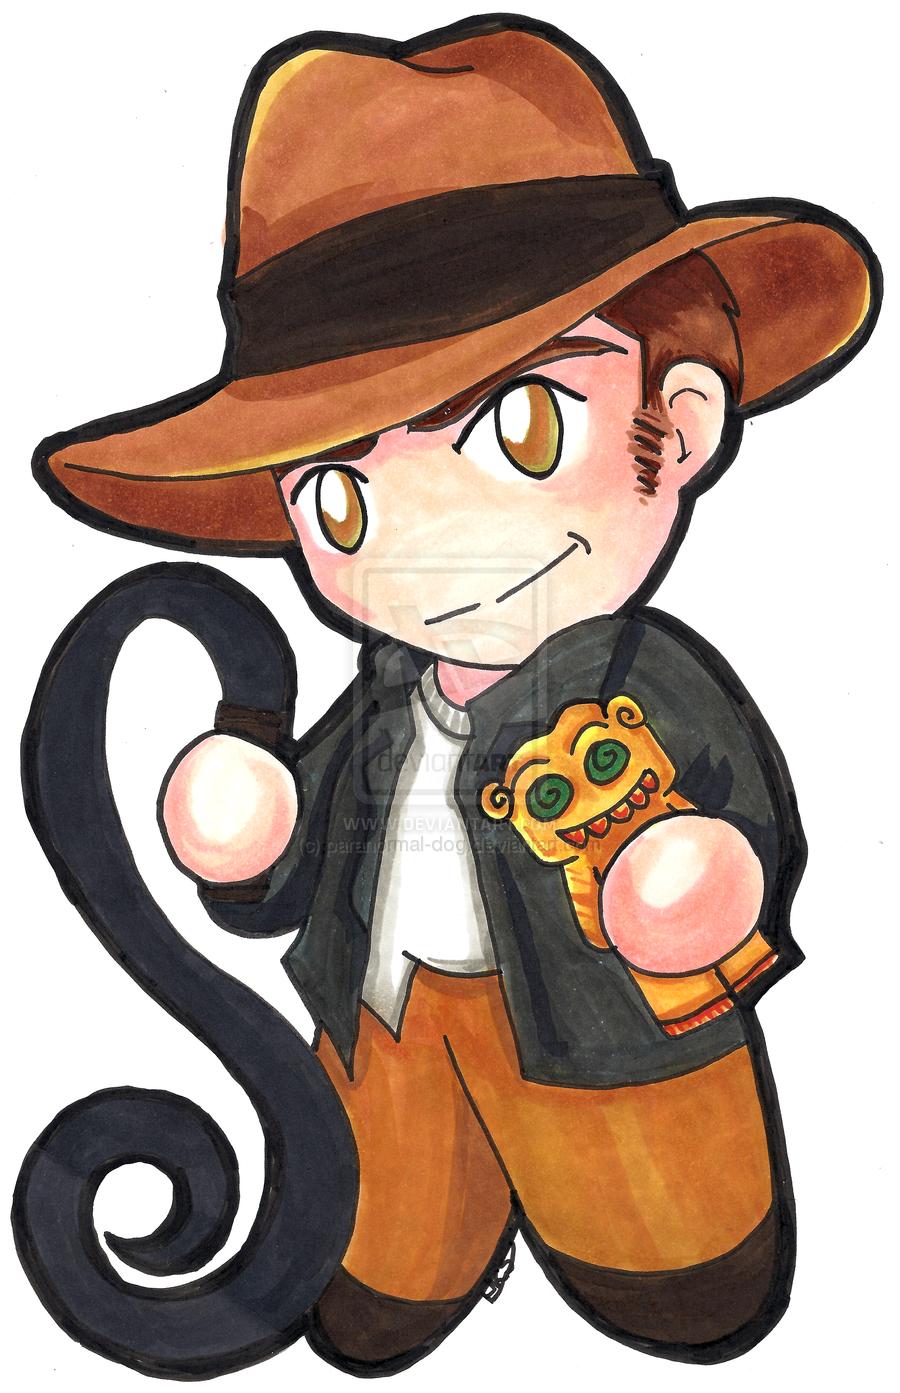 Indiana Jones Chibi Indiana Jones Chibi Copic Marker Drawings